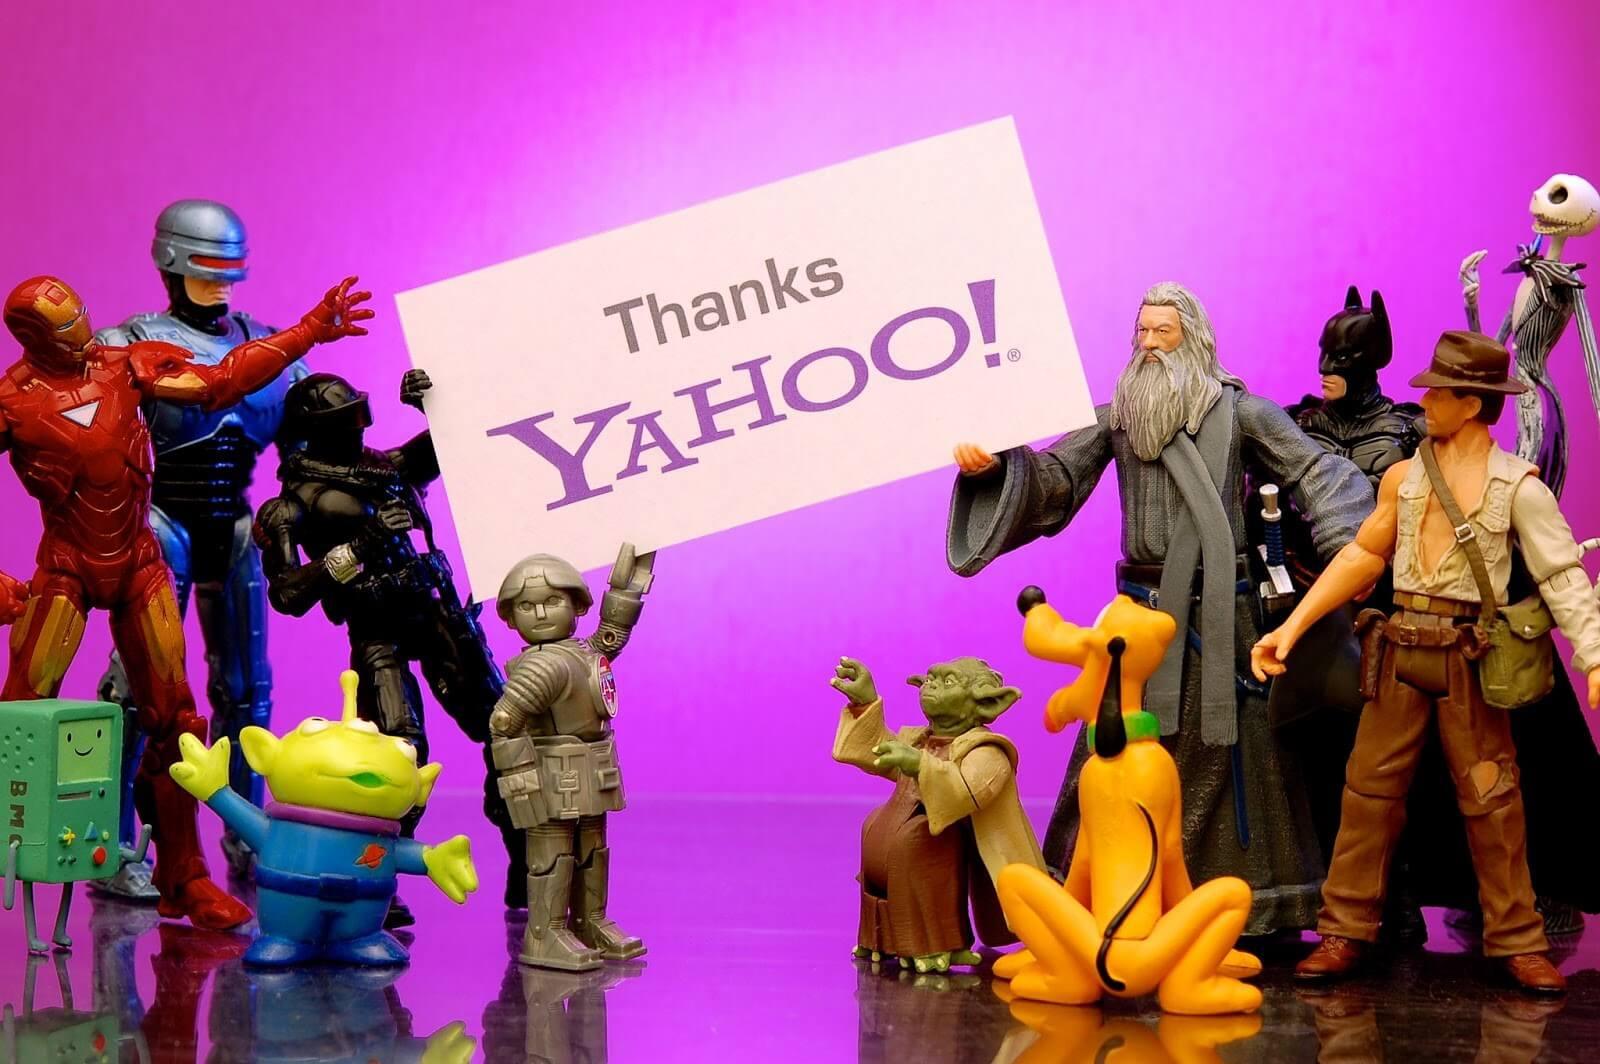 [recovery mode] Verizon завершили поглощение Yahoo